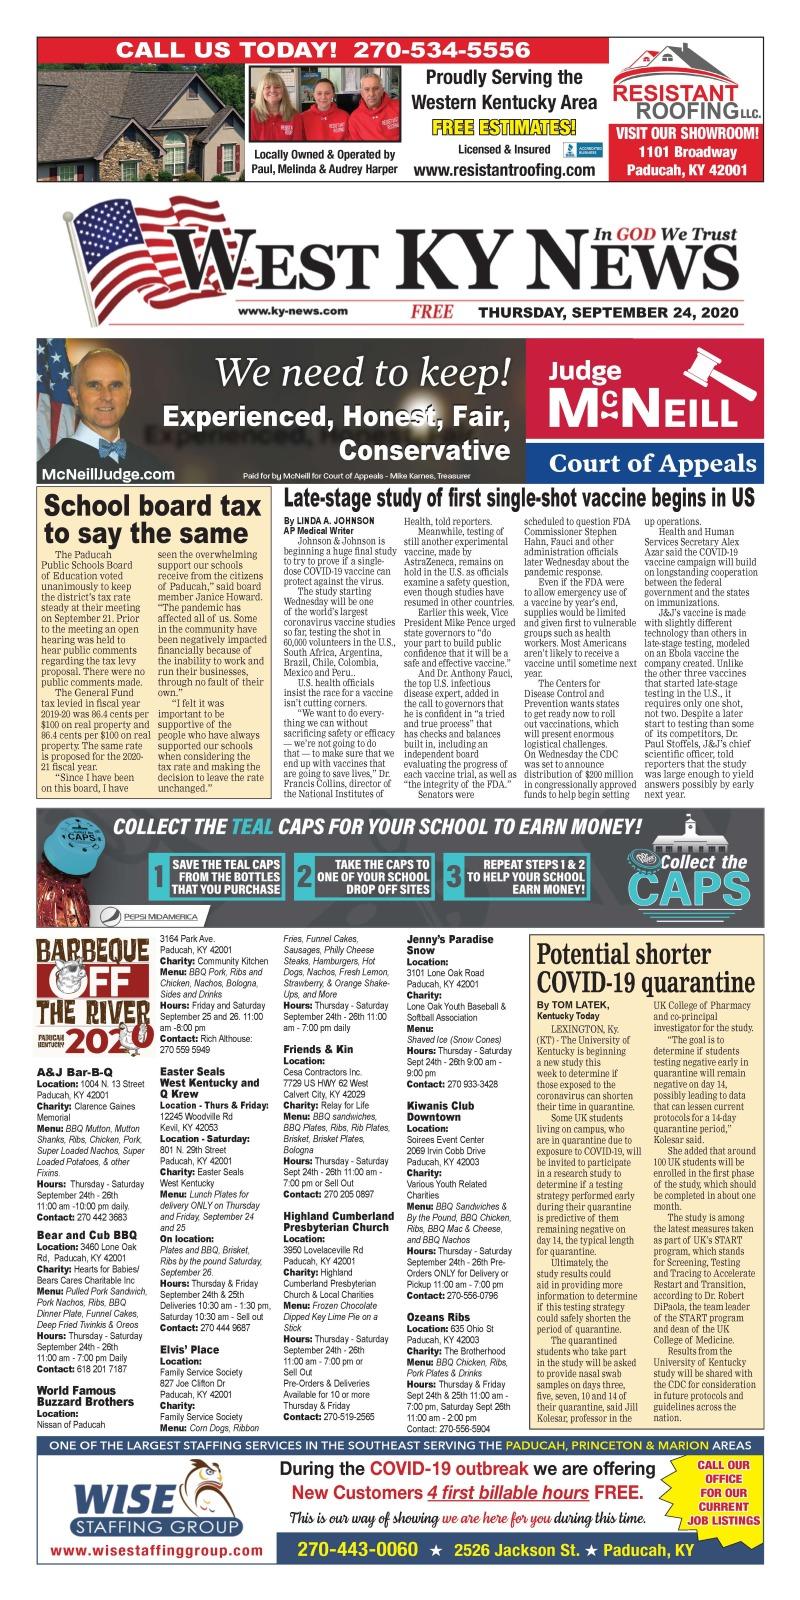 West KY News 9-24-20